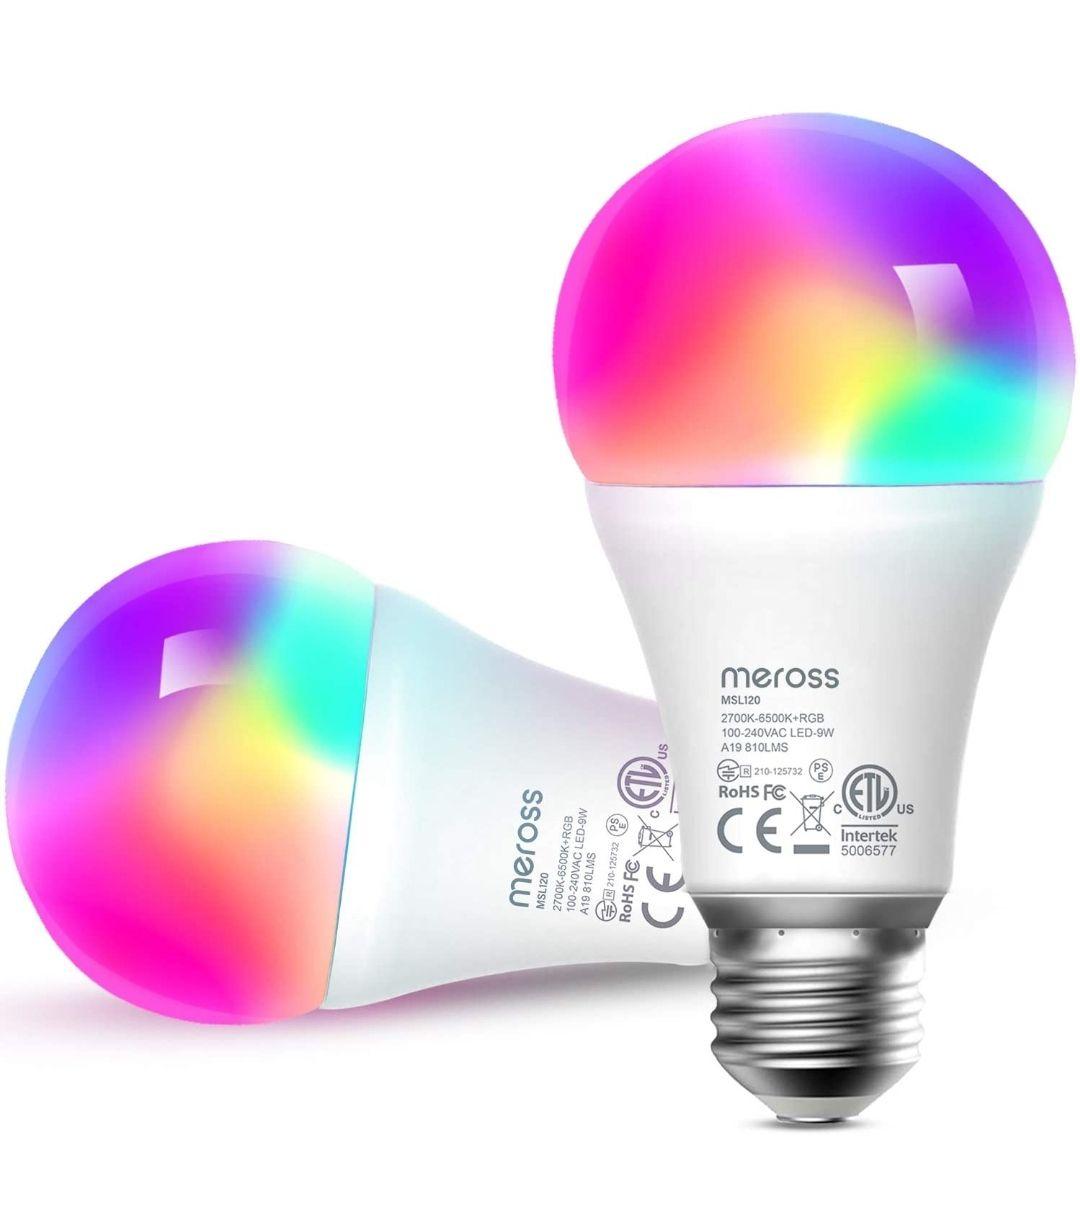 Pack de 2 Bombilla LED compatible con Alexa y Google assistant